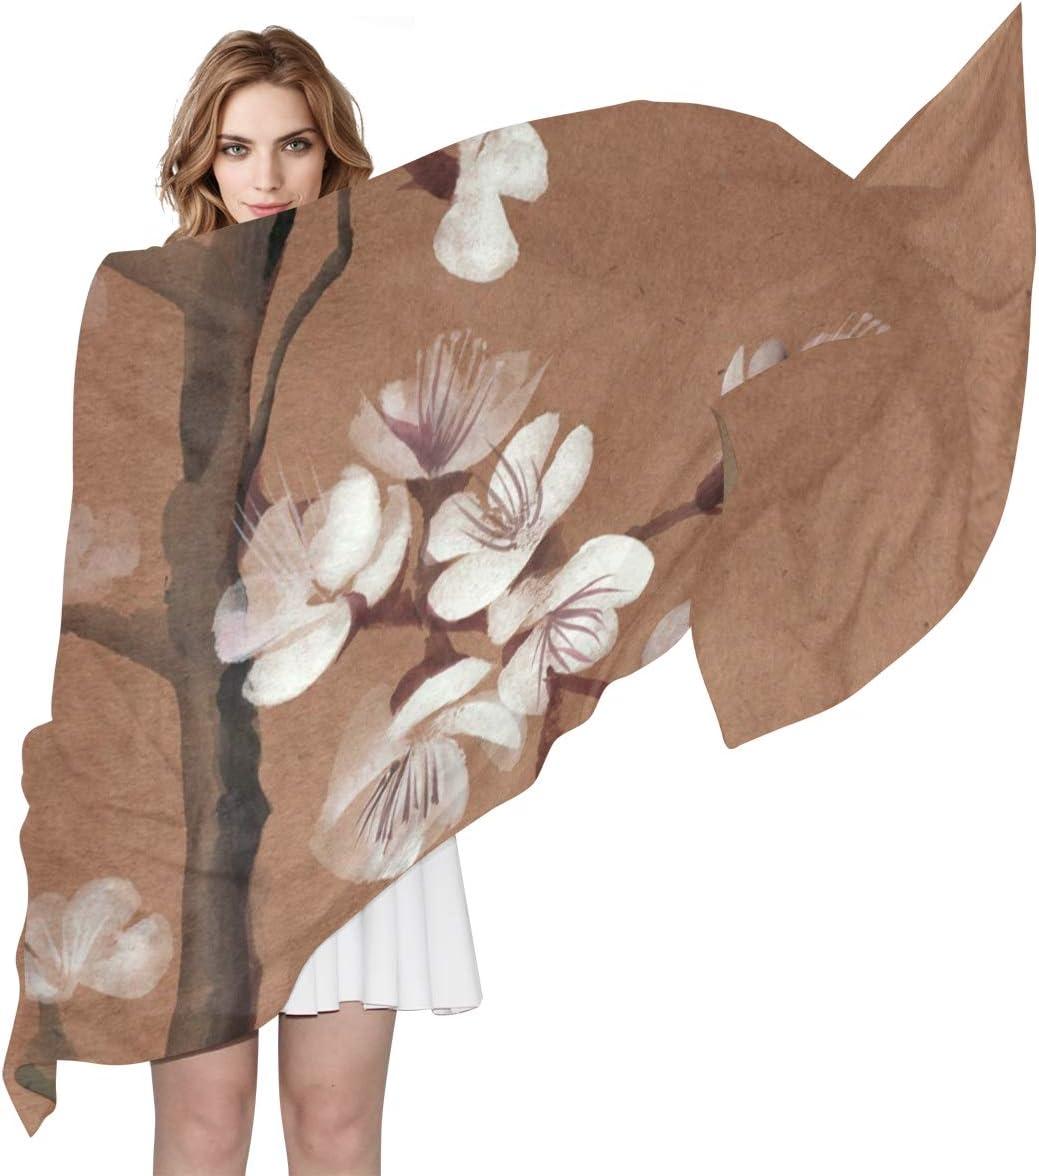 AUUXVA Fashion Scarf Abstract Floral Japanese Cherry Blossom Long Lightweight Sunscreen Scarf Shawl Wrap Muffler Neckerchief for Women Men